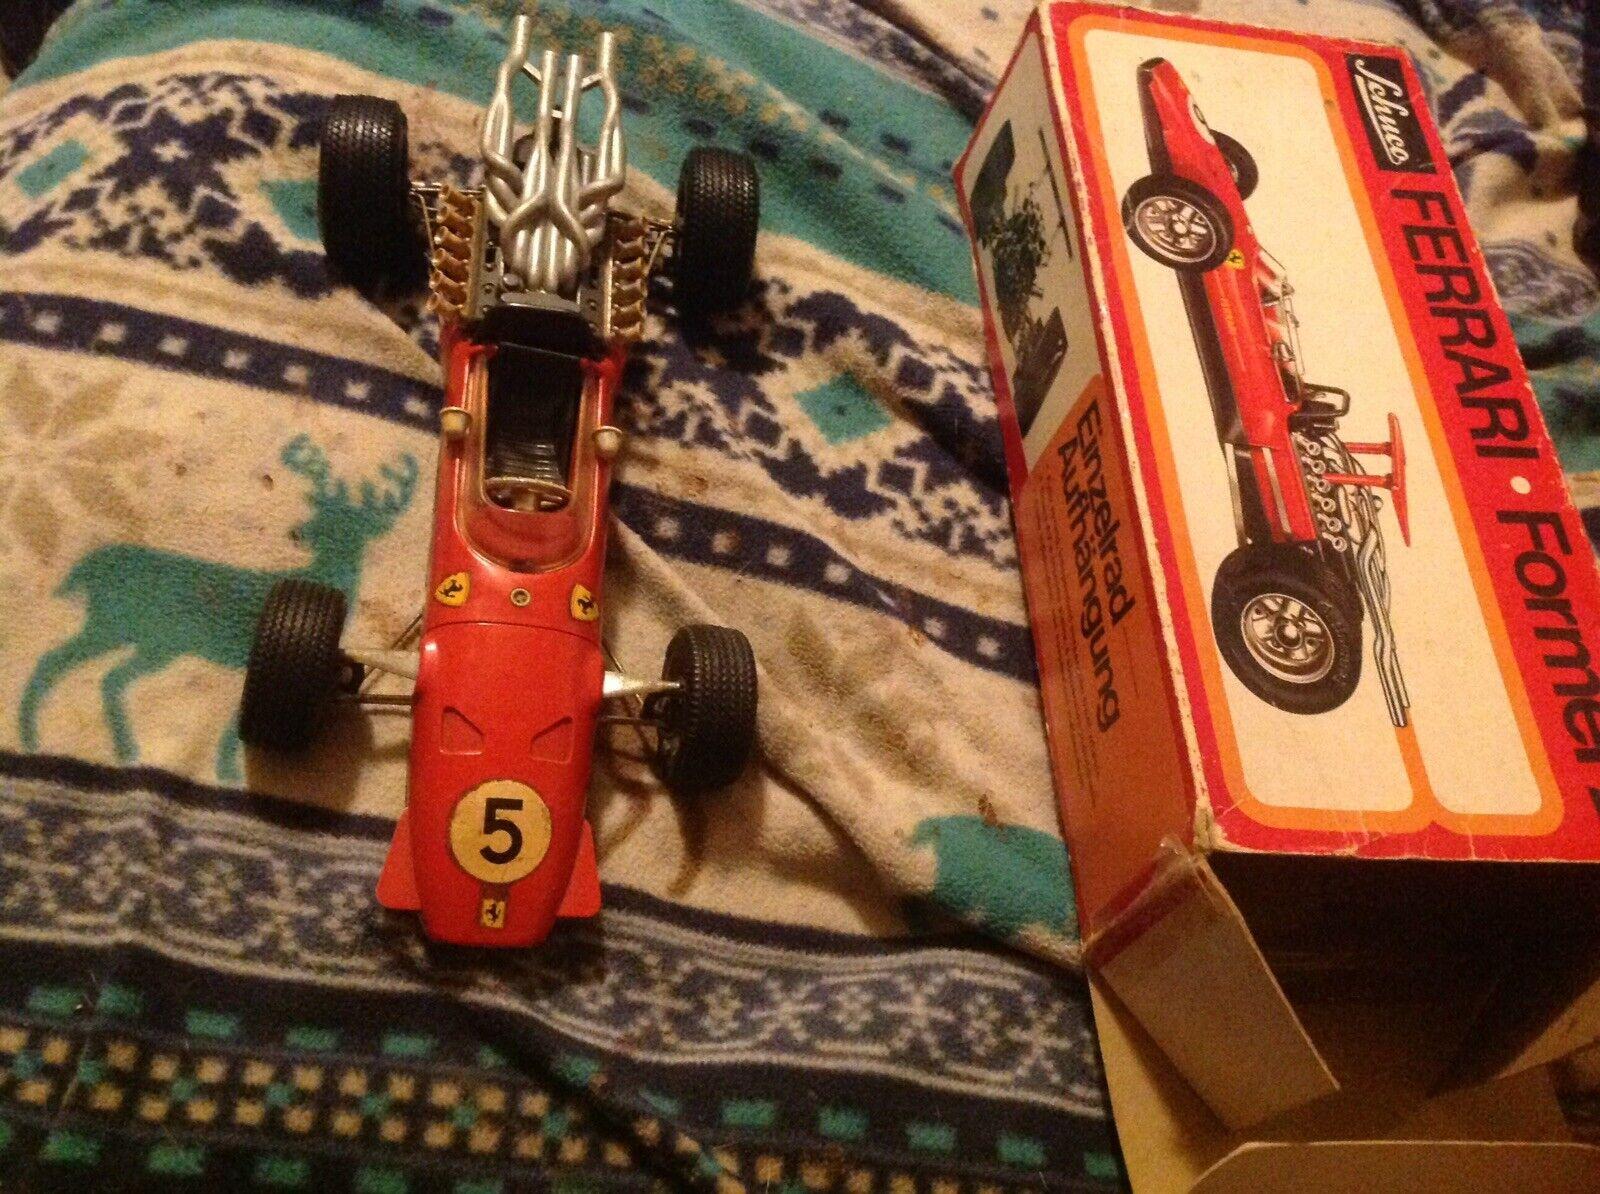 Ferrari Fórmula 2 Schuco Modelo 1073 terminan ninguna clave